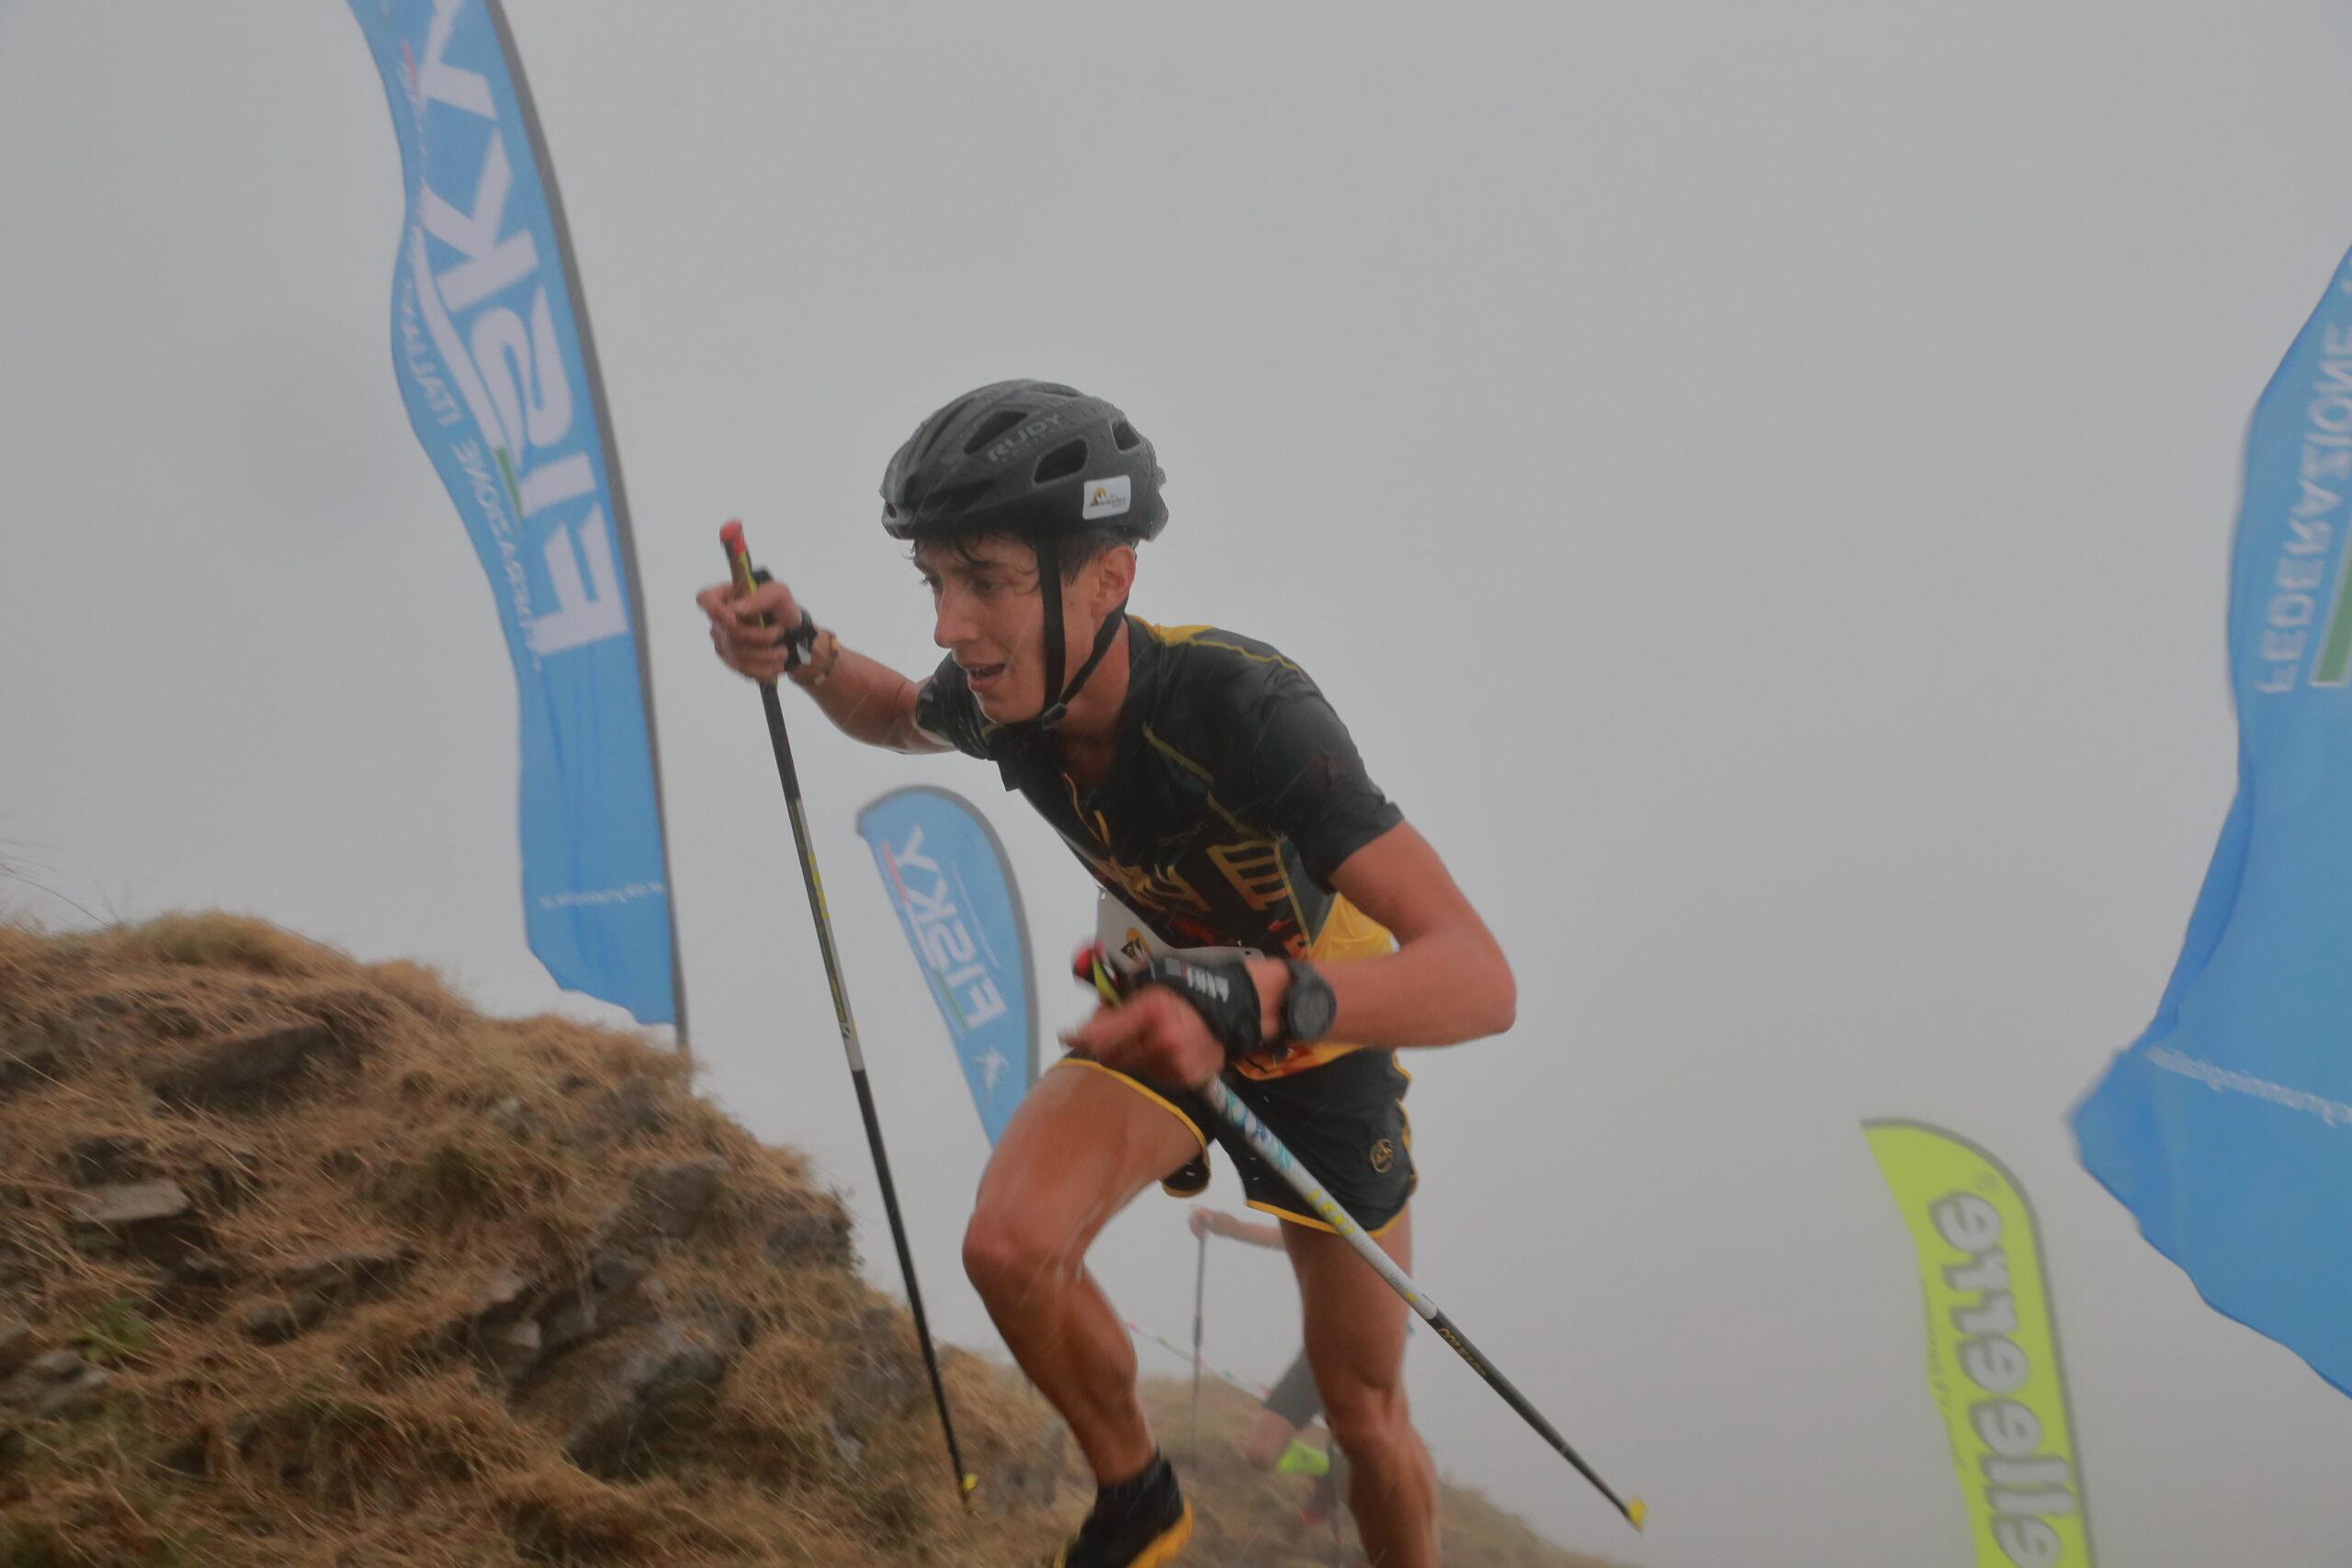 Thi is Vertical Race 2021 - foto Fabrizio Servalli